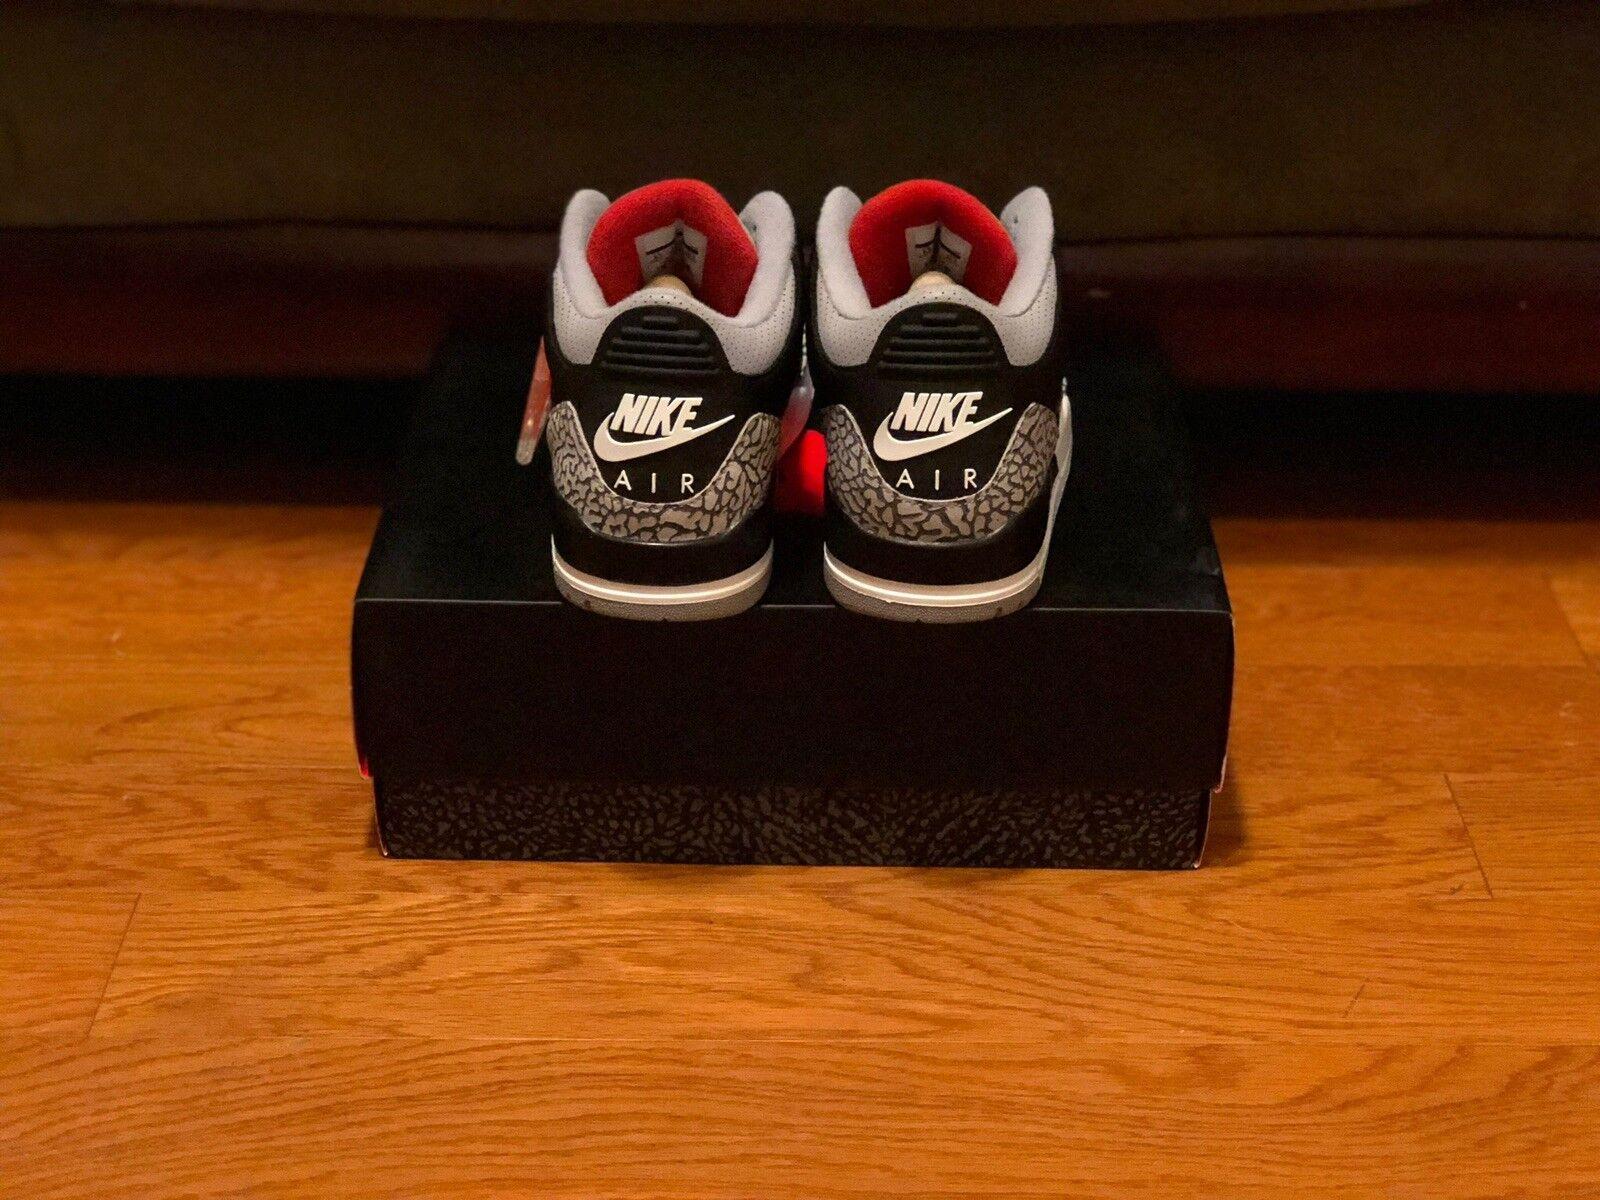 65b01922894 Nike Air Retro 3 Black Cement 88 sz US 8.5 Tinker Jordan  nouqwj8596-Athletic Shoes